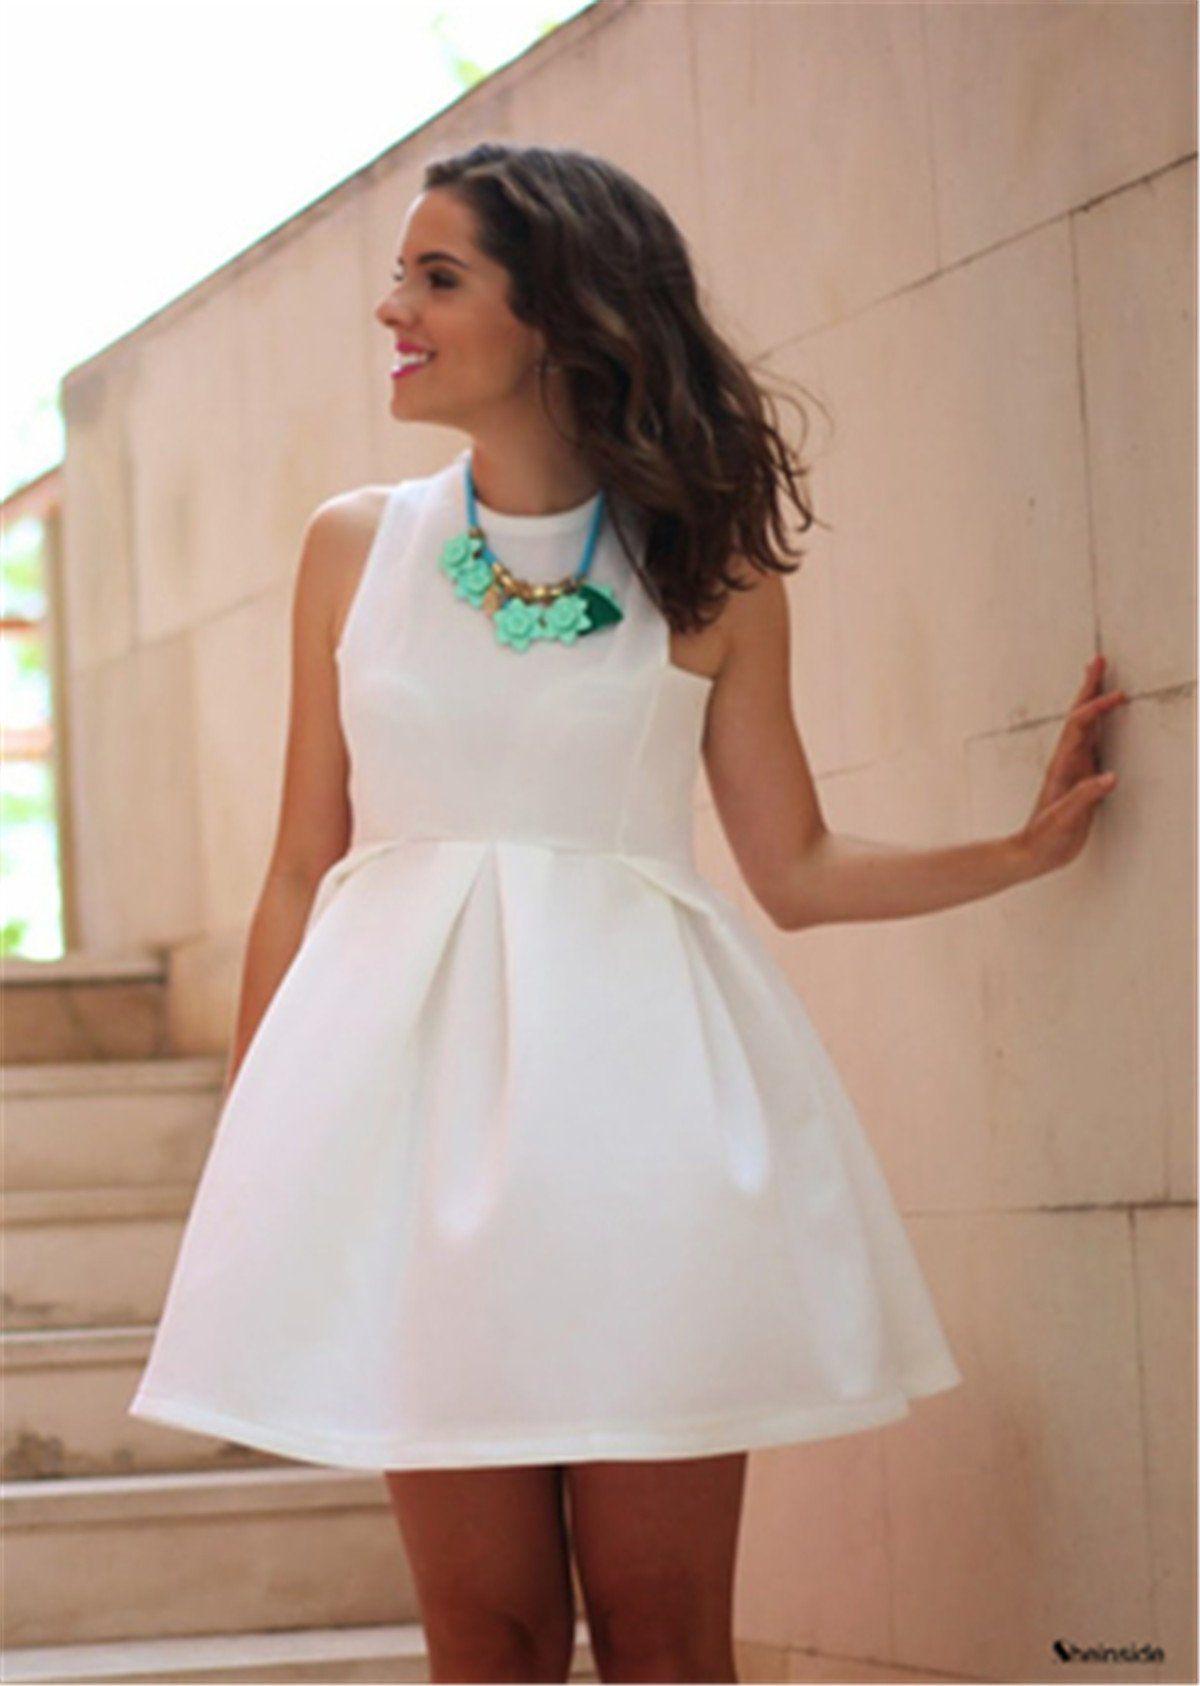 fe348ffee4564b Sheinside Women s White Round Neck Sleeveless Flare Pleated Dress at Amazon  Women s Clothing store